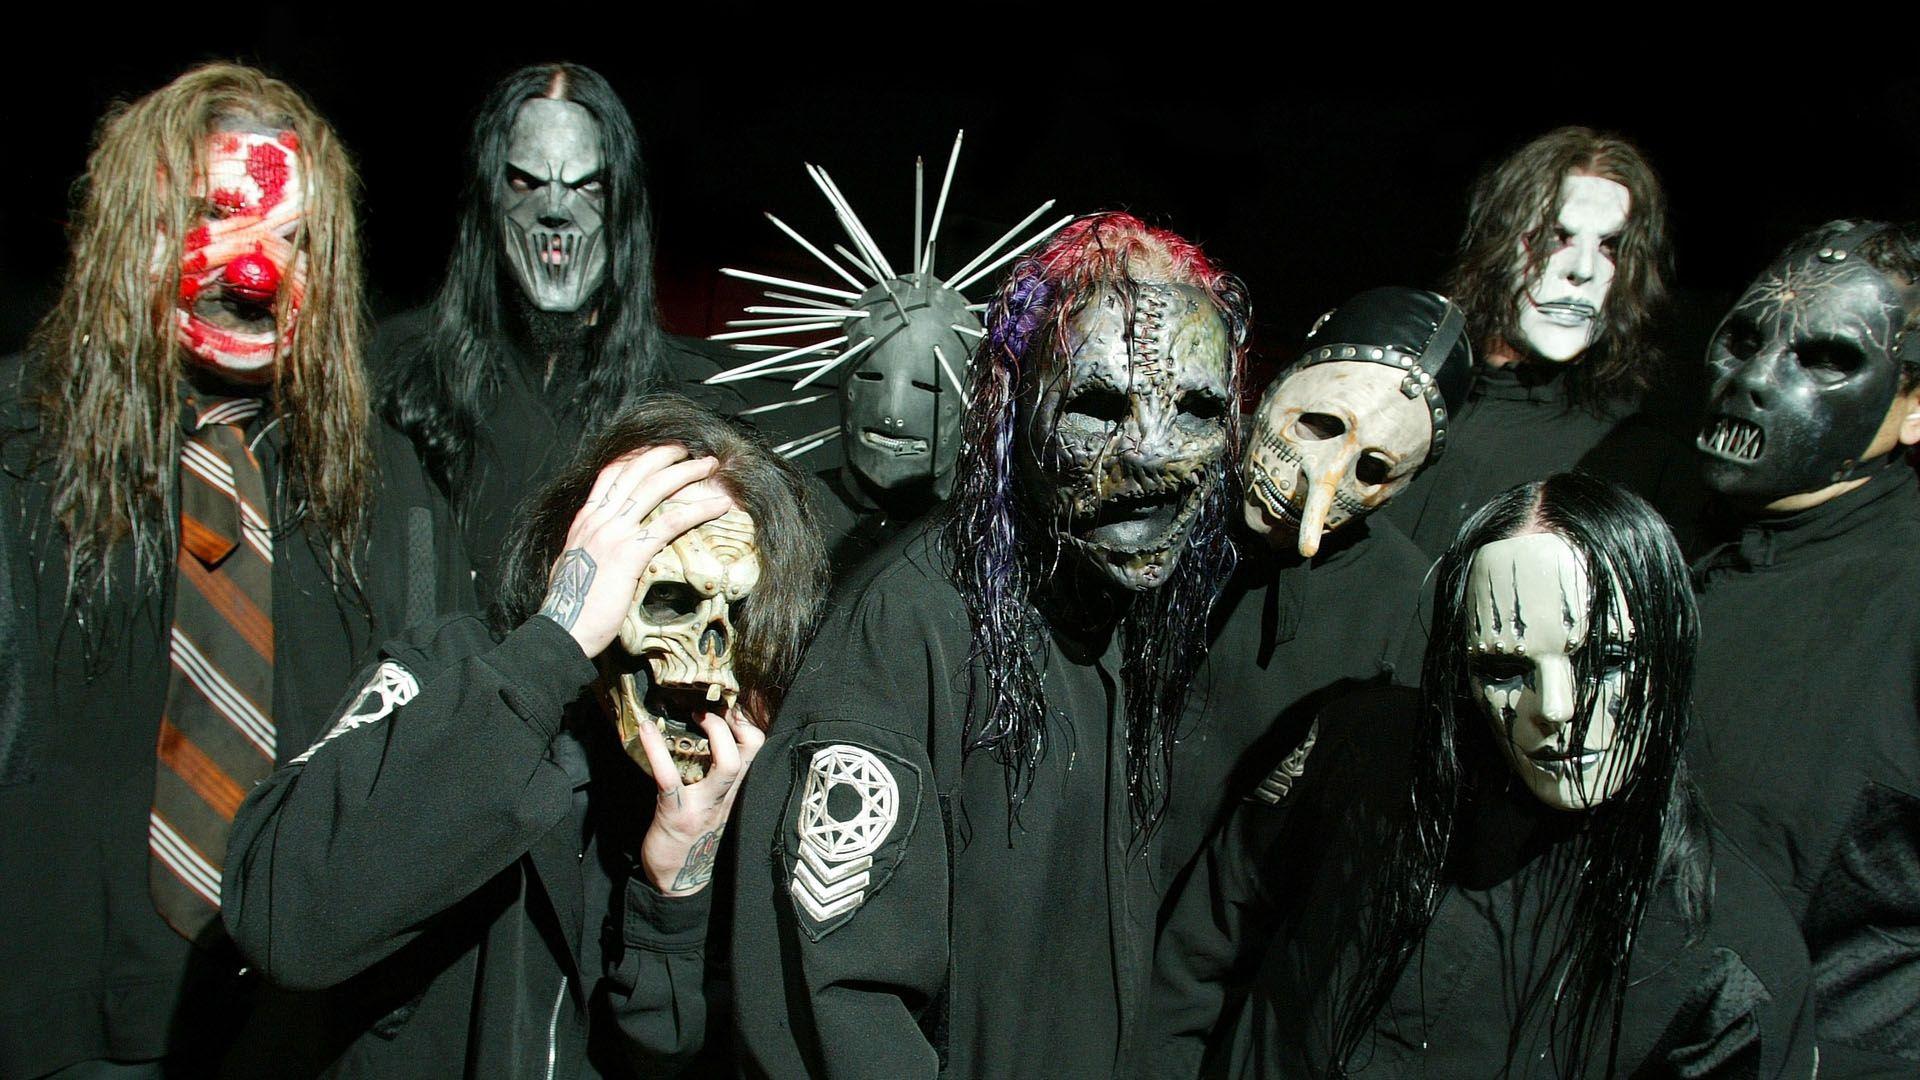 Slipknot Download Free Backgrounds Hd